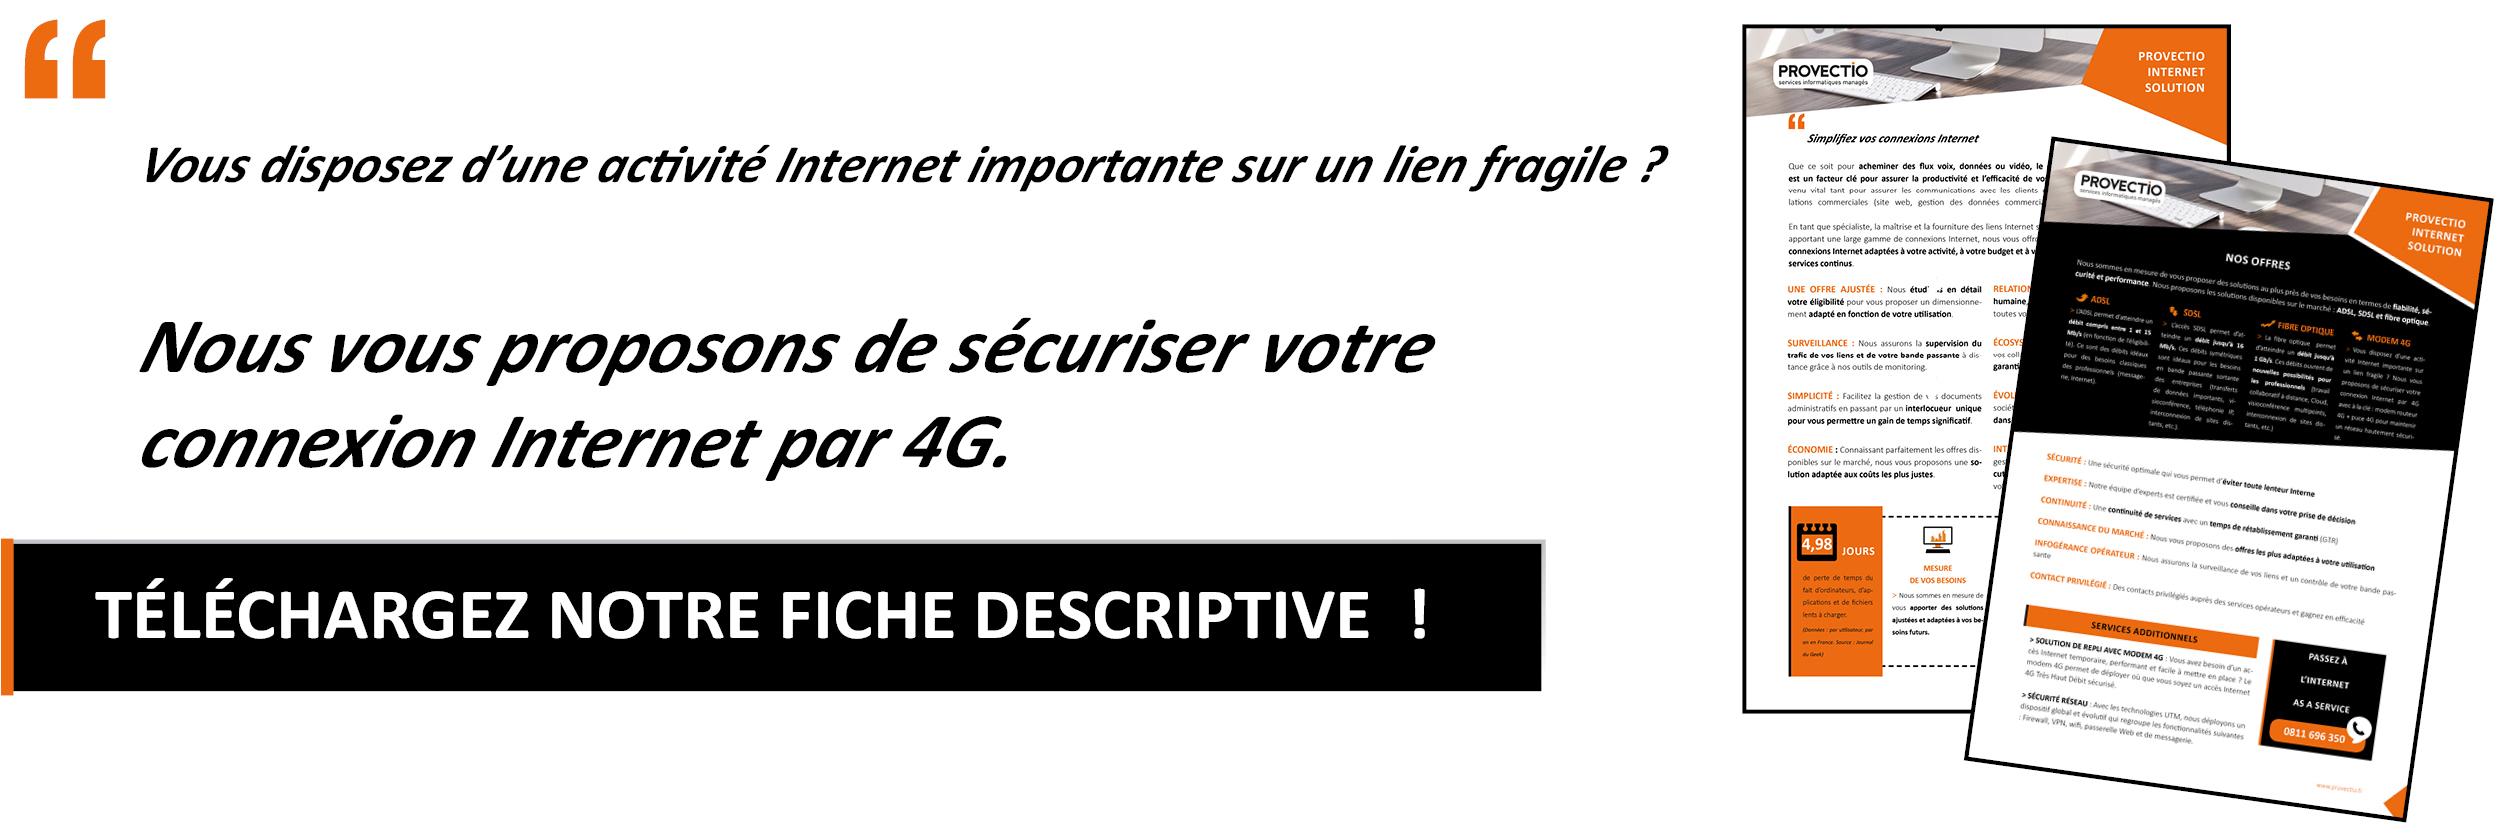 Connexion internet 4G